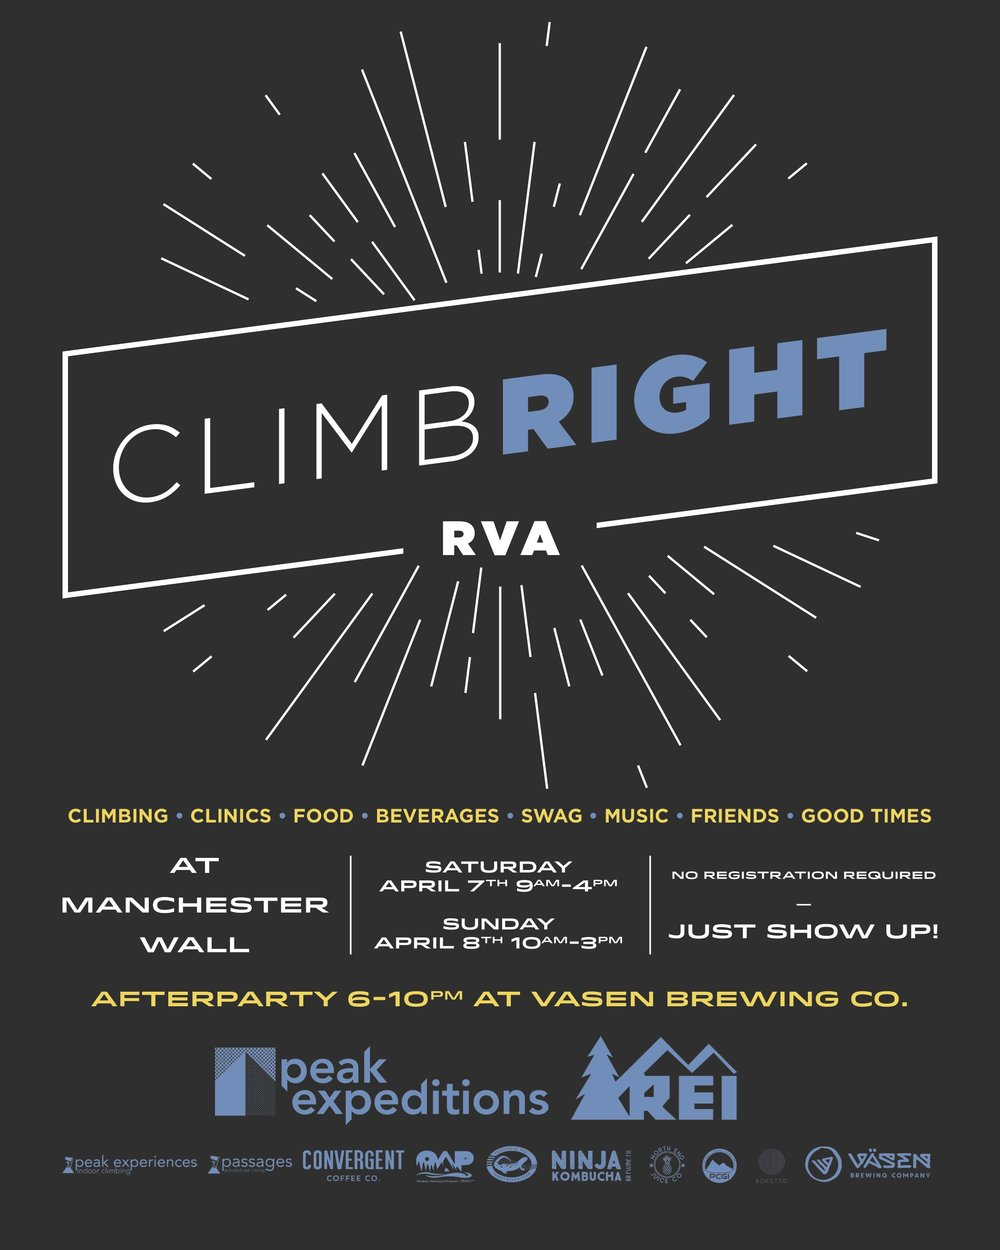 ClimbRight8x10.jpg